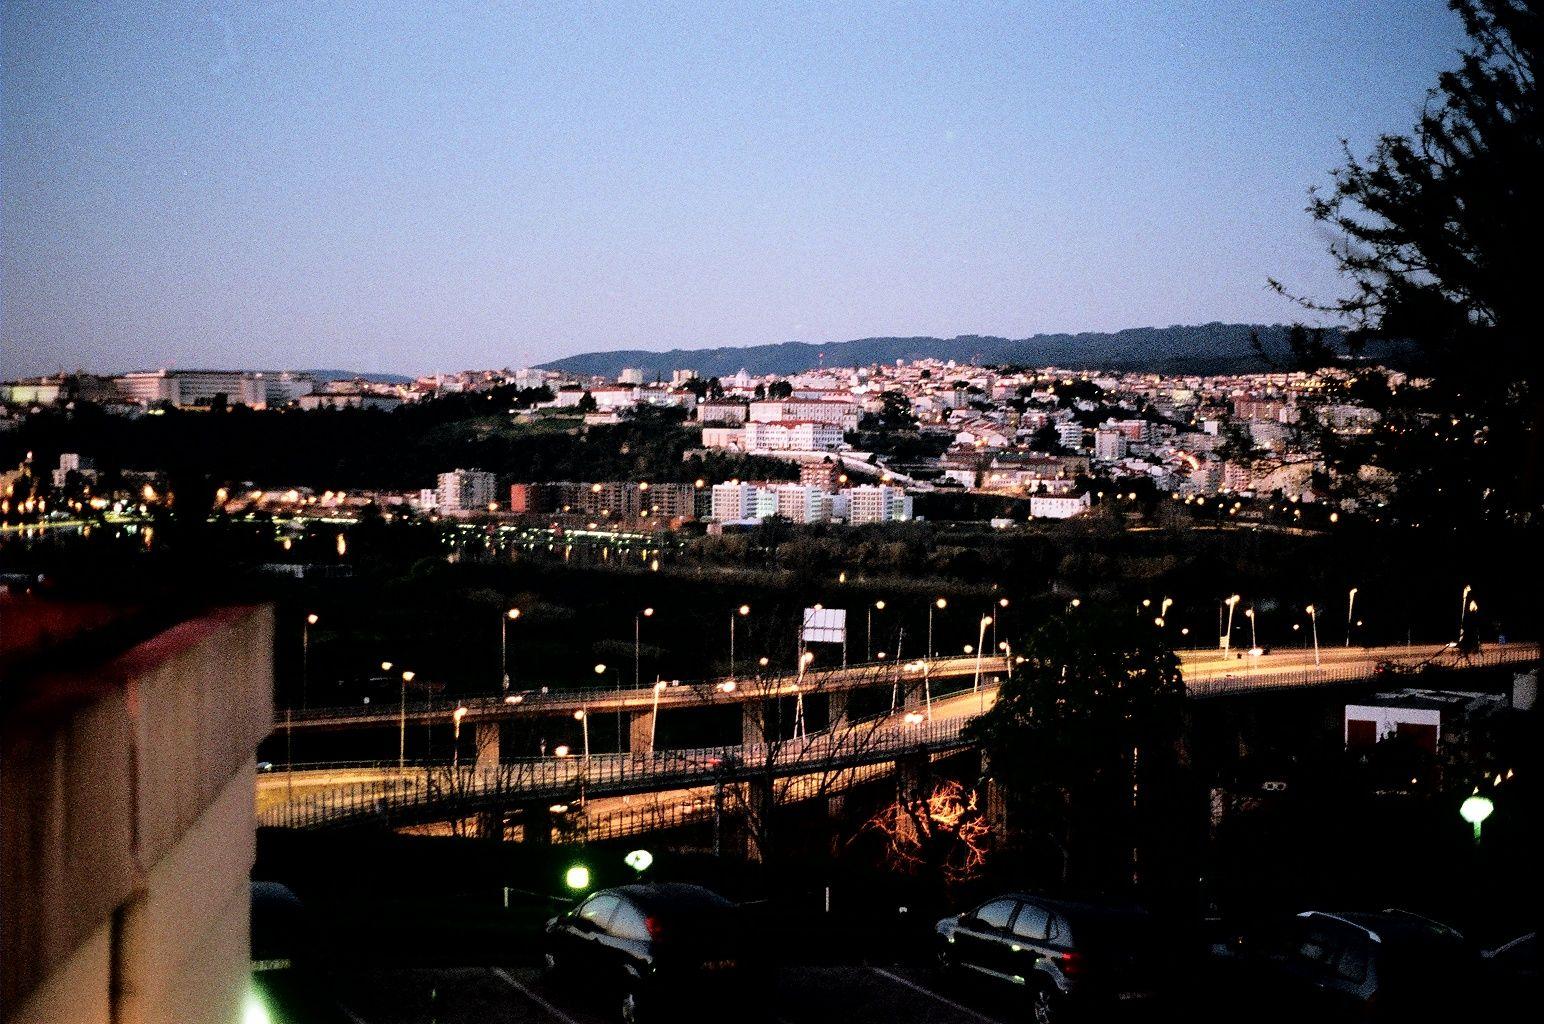 Coimbra at night. Portugal